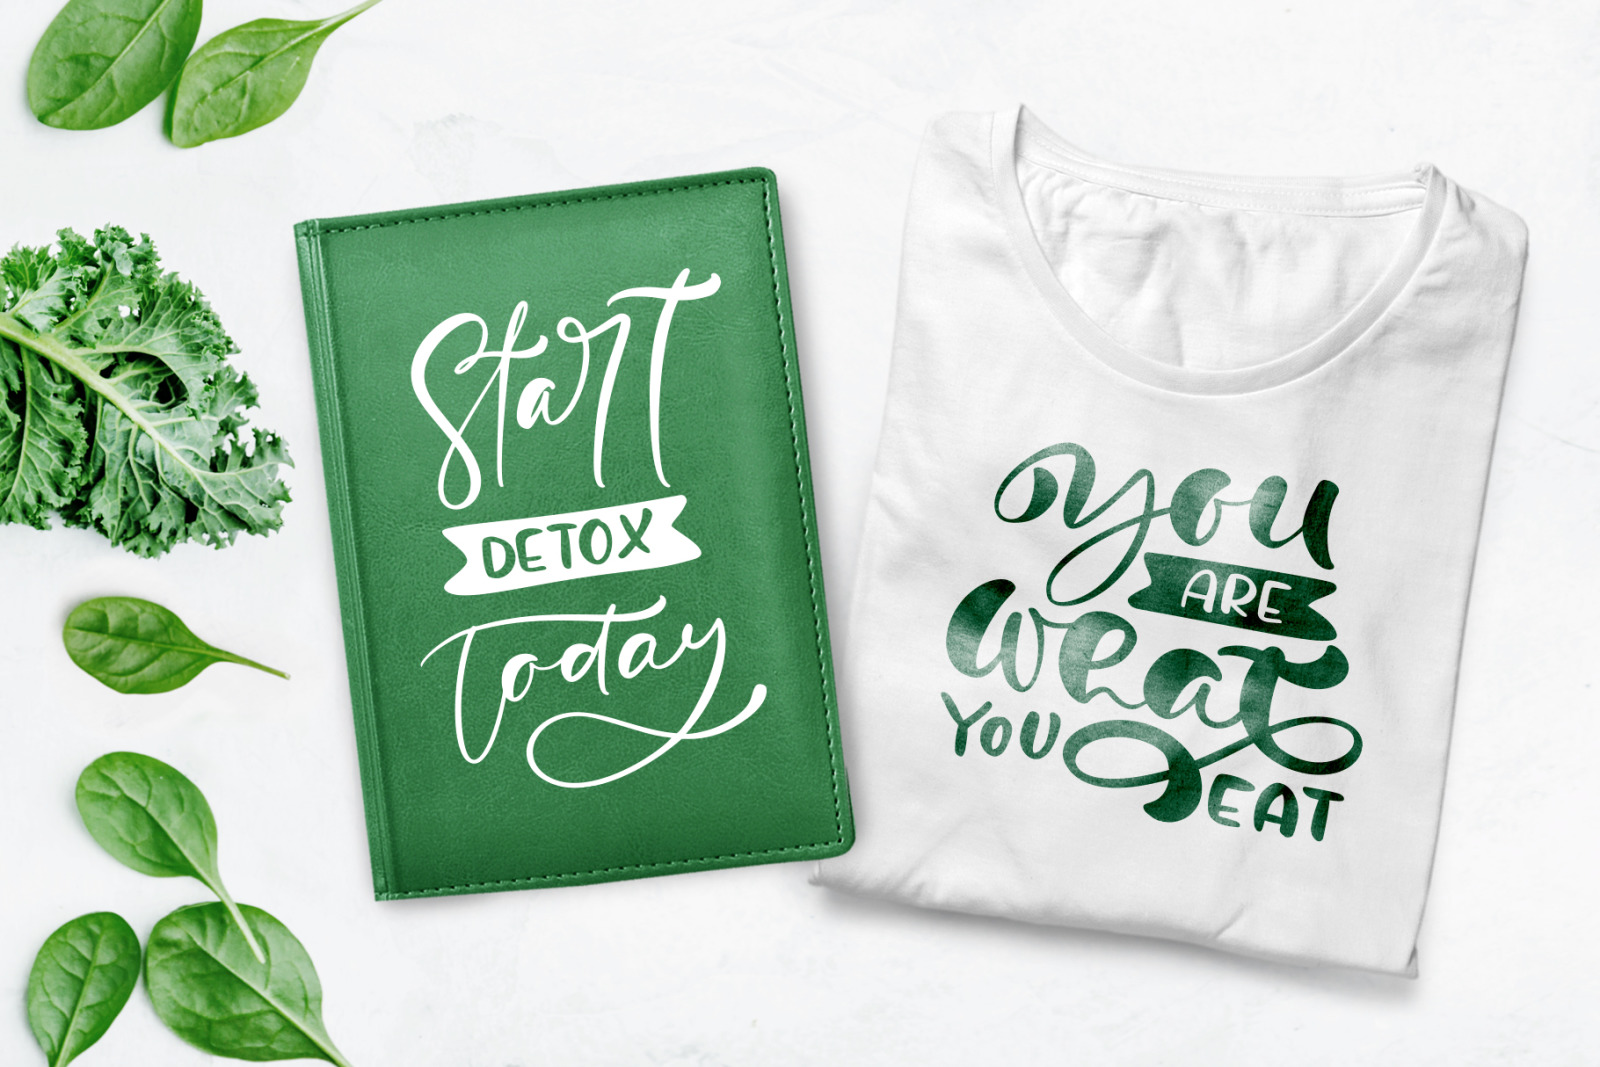 Start Detox Today Lettering Text